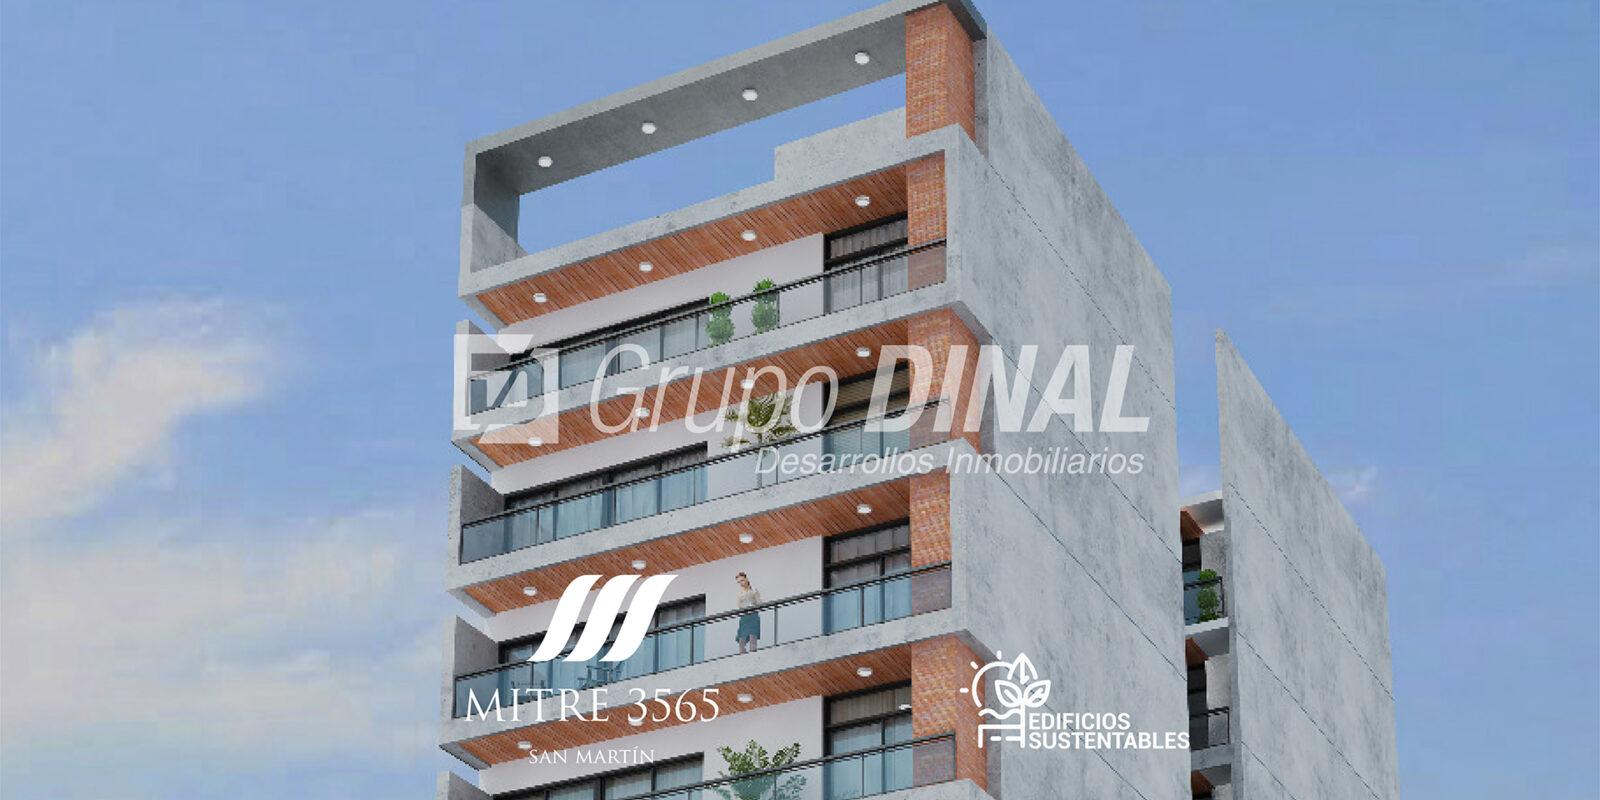 Mitre 3565 | San Martín